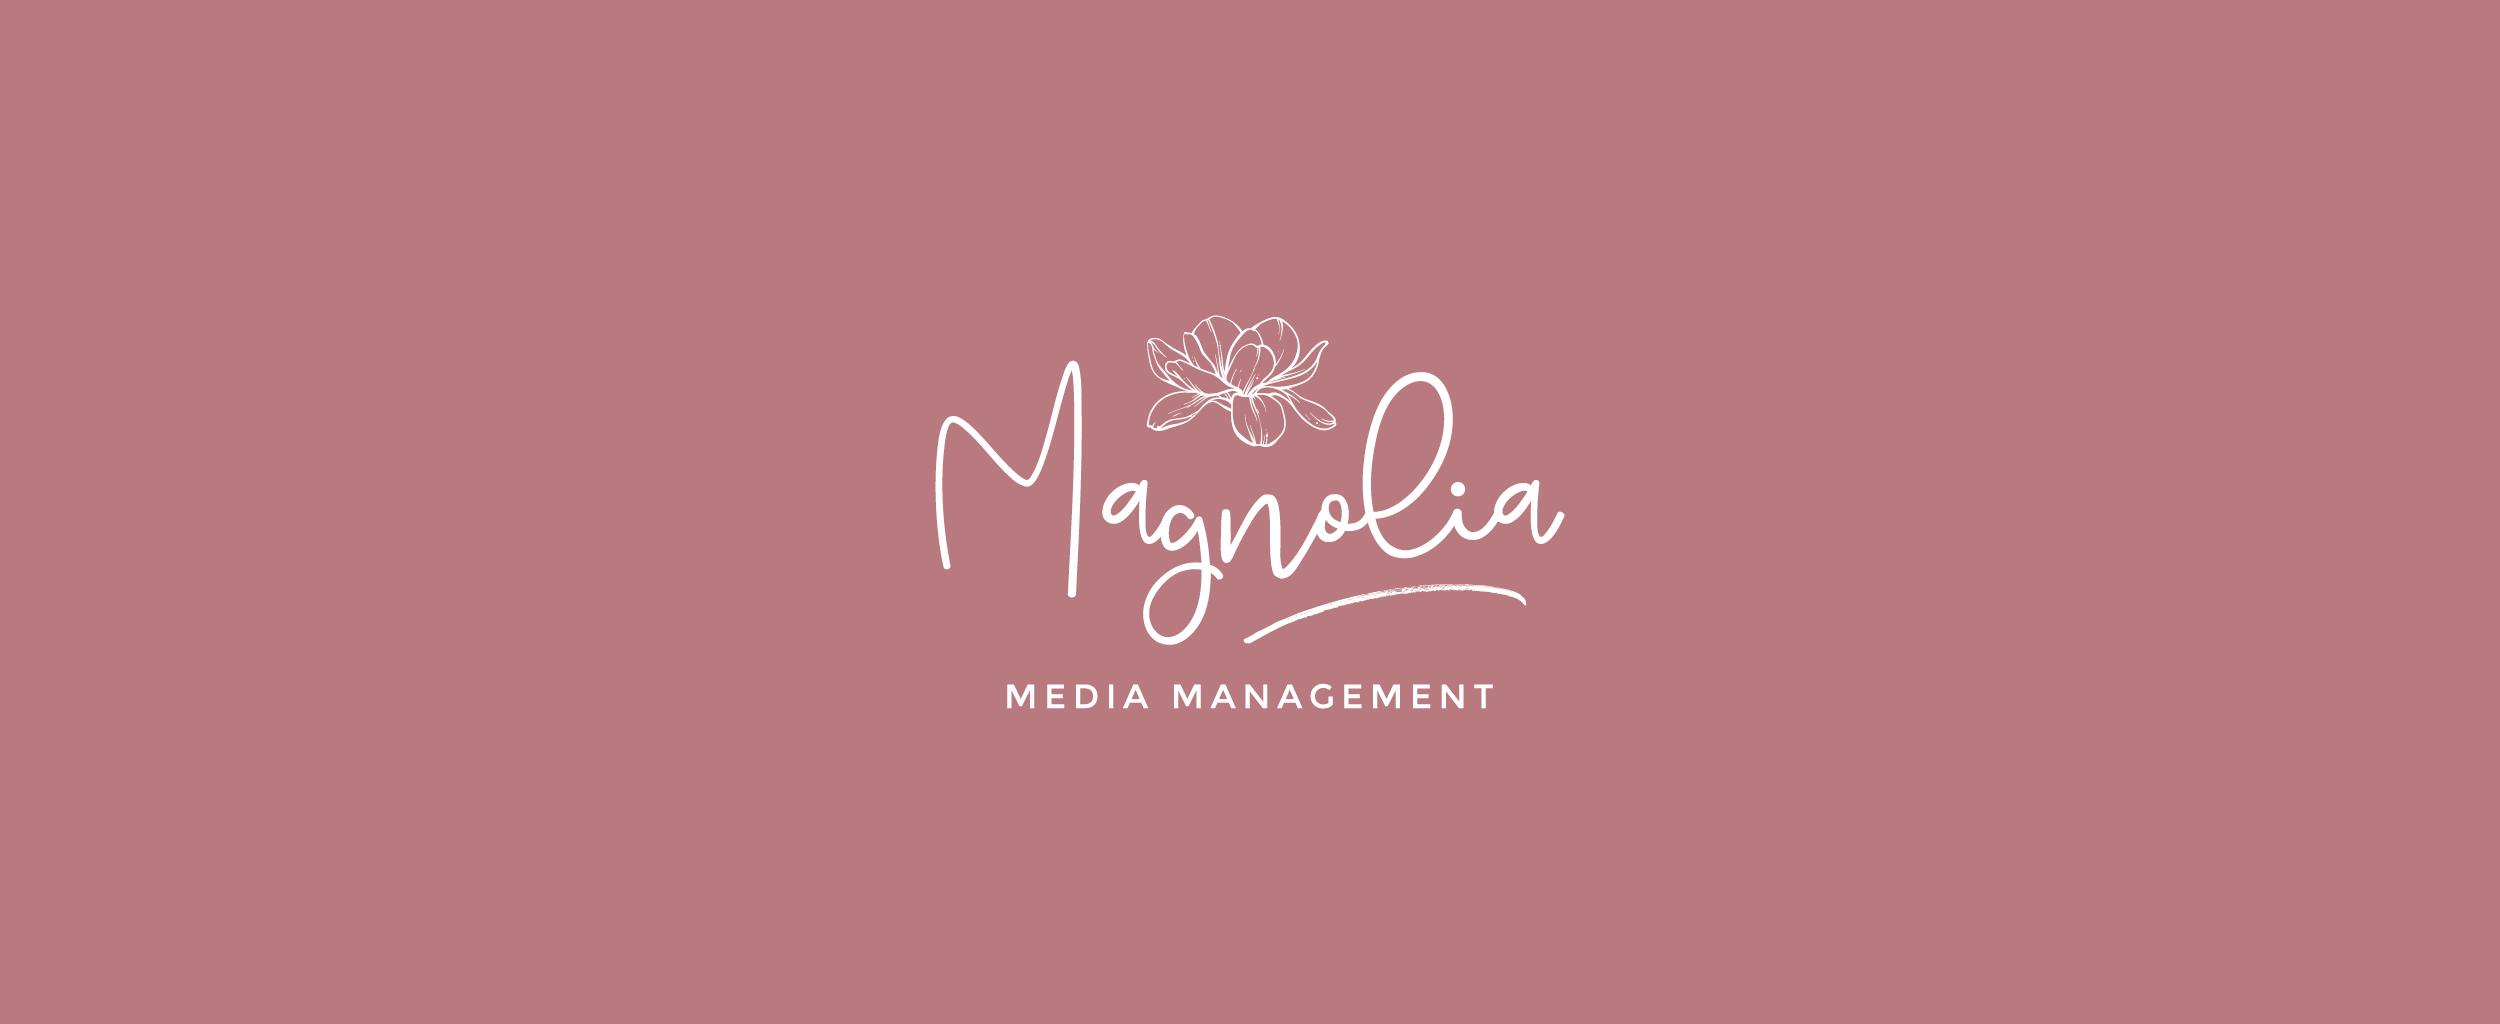 Magnolia_BRANDING_01.png